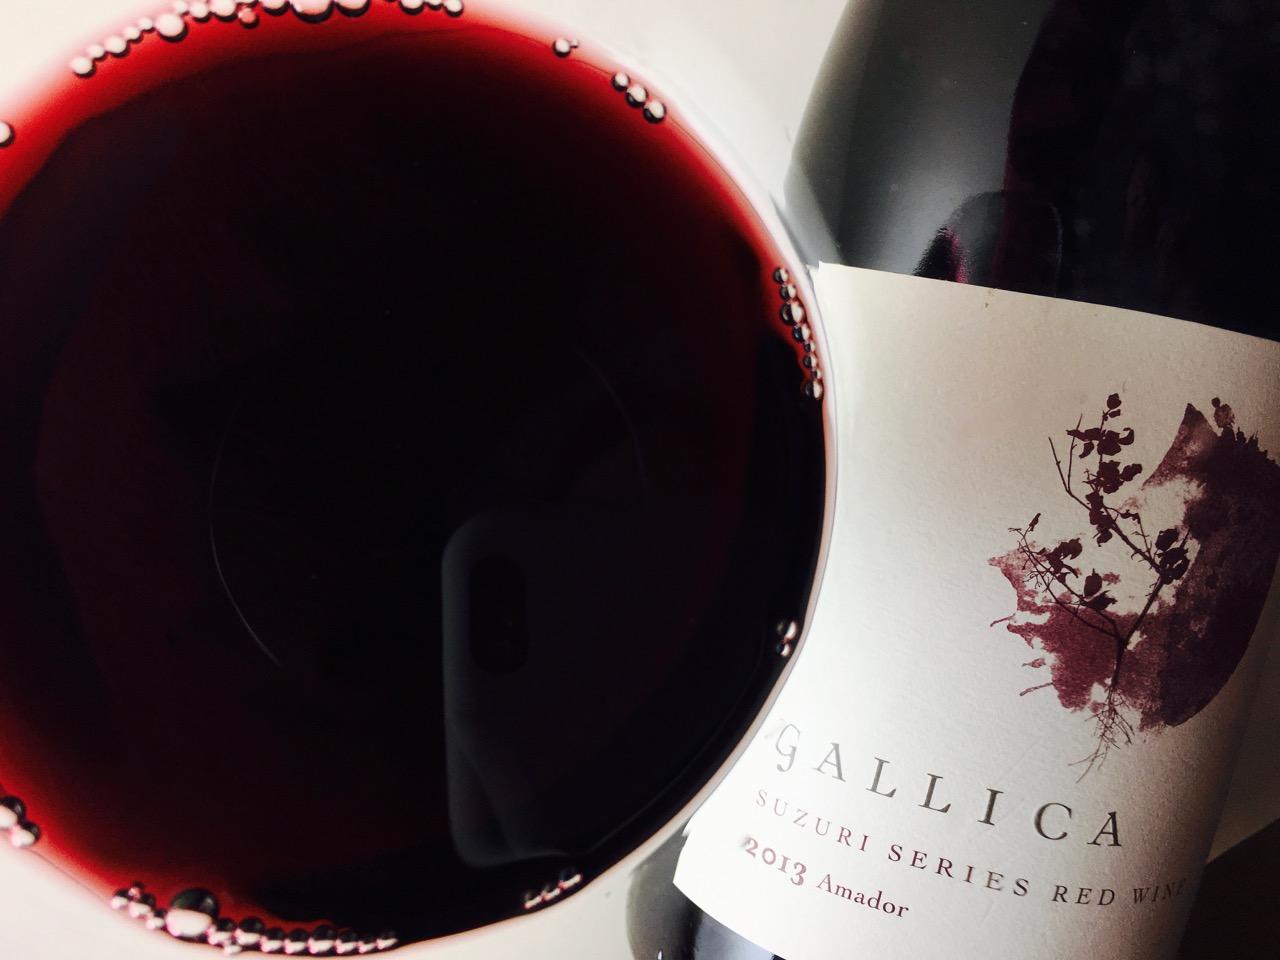 2013 Gallica Suzuri Red Wine Shake Ridge Ranch Amador County